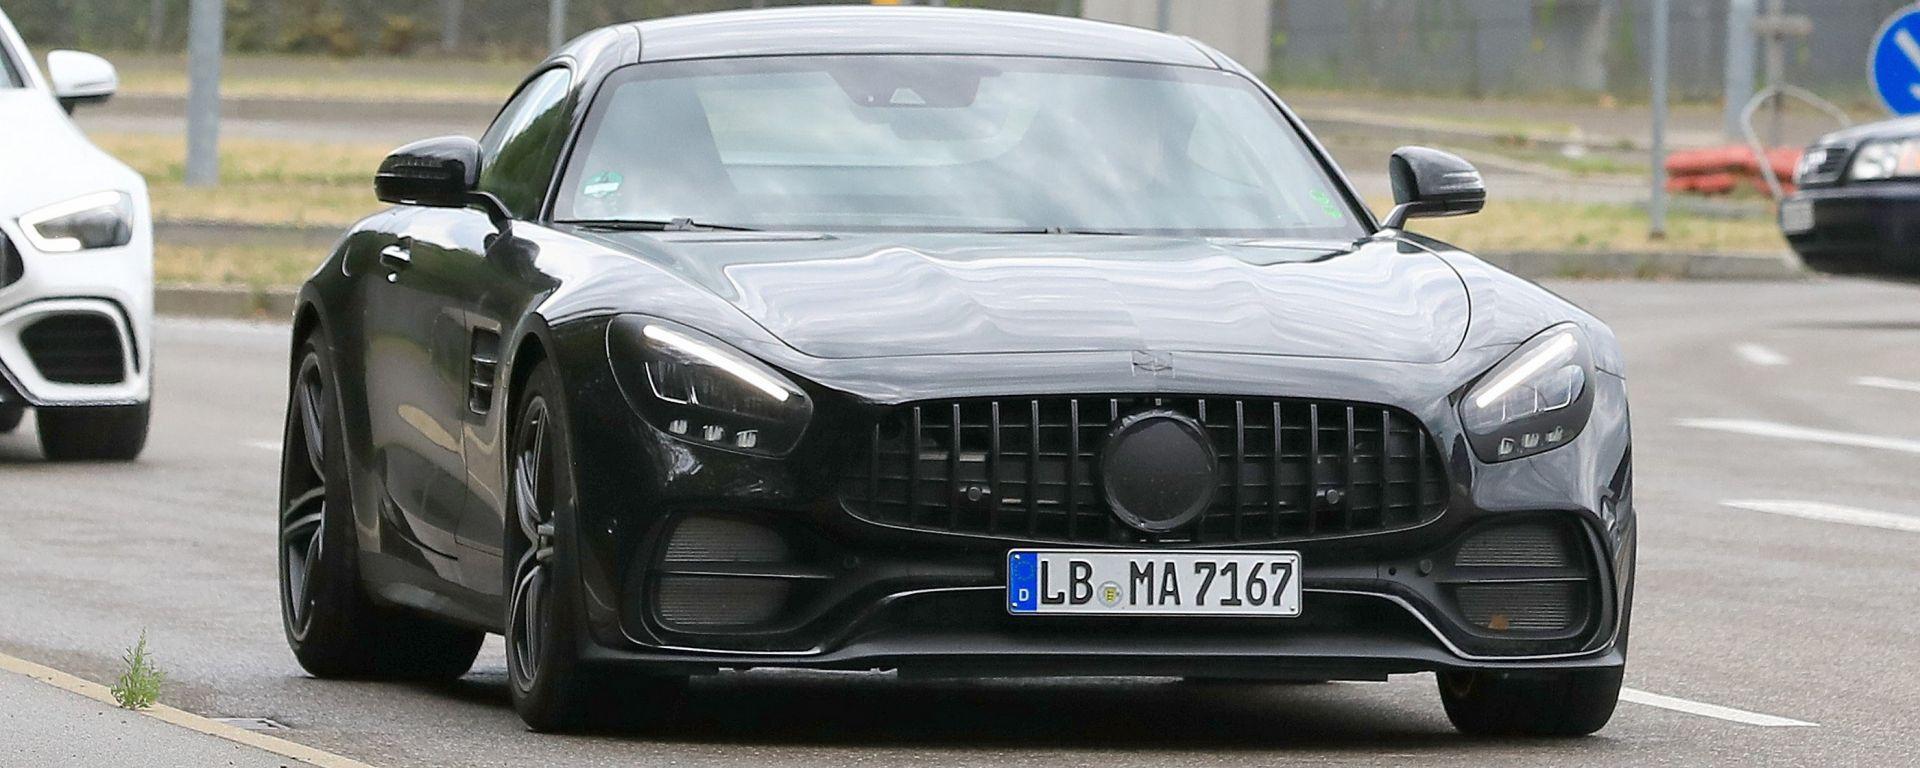 Mercedes-AMG GT: spuntano le prime foto spia del Facelift